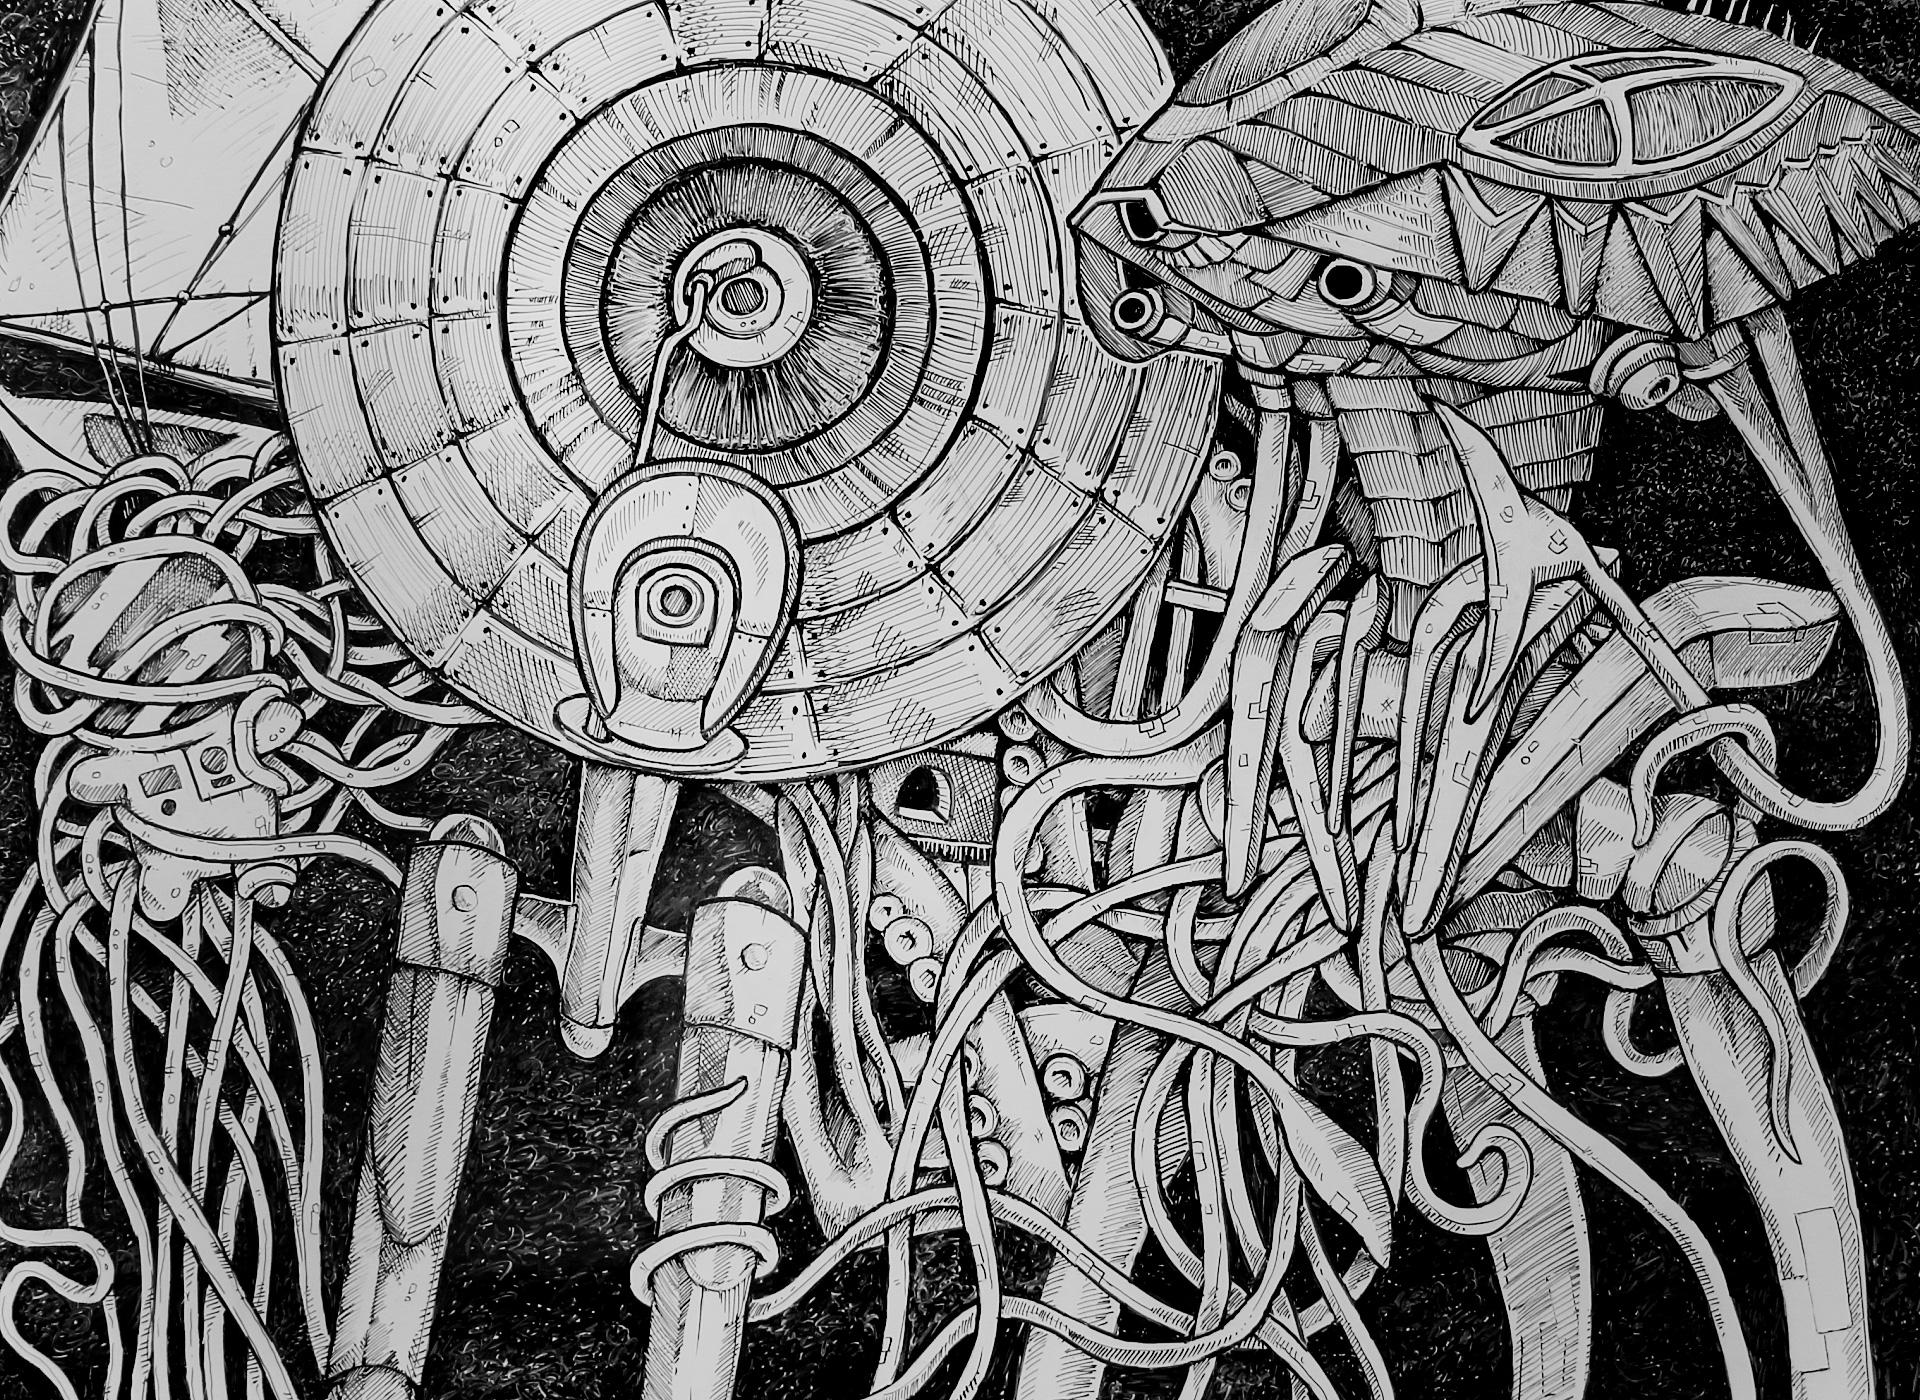 doodles8.jpg